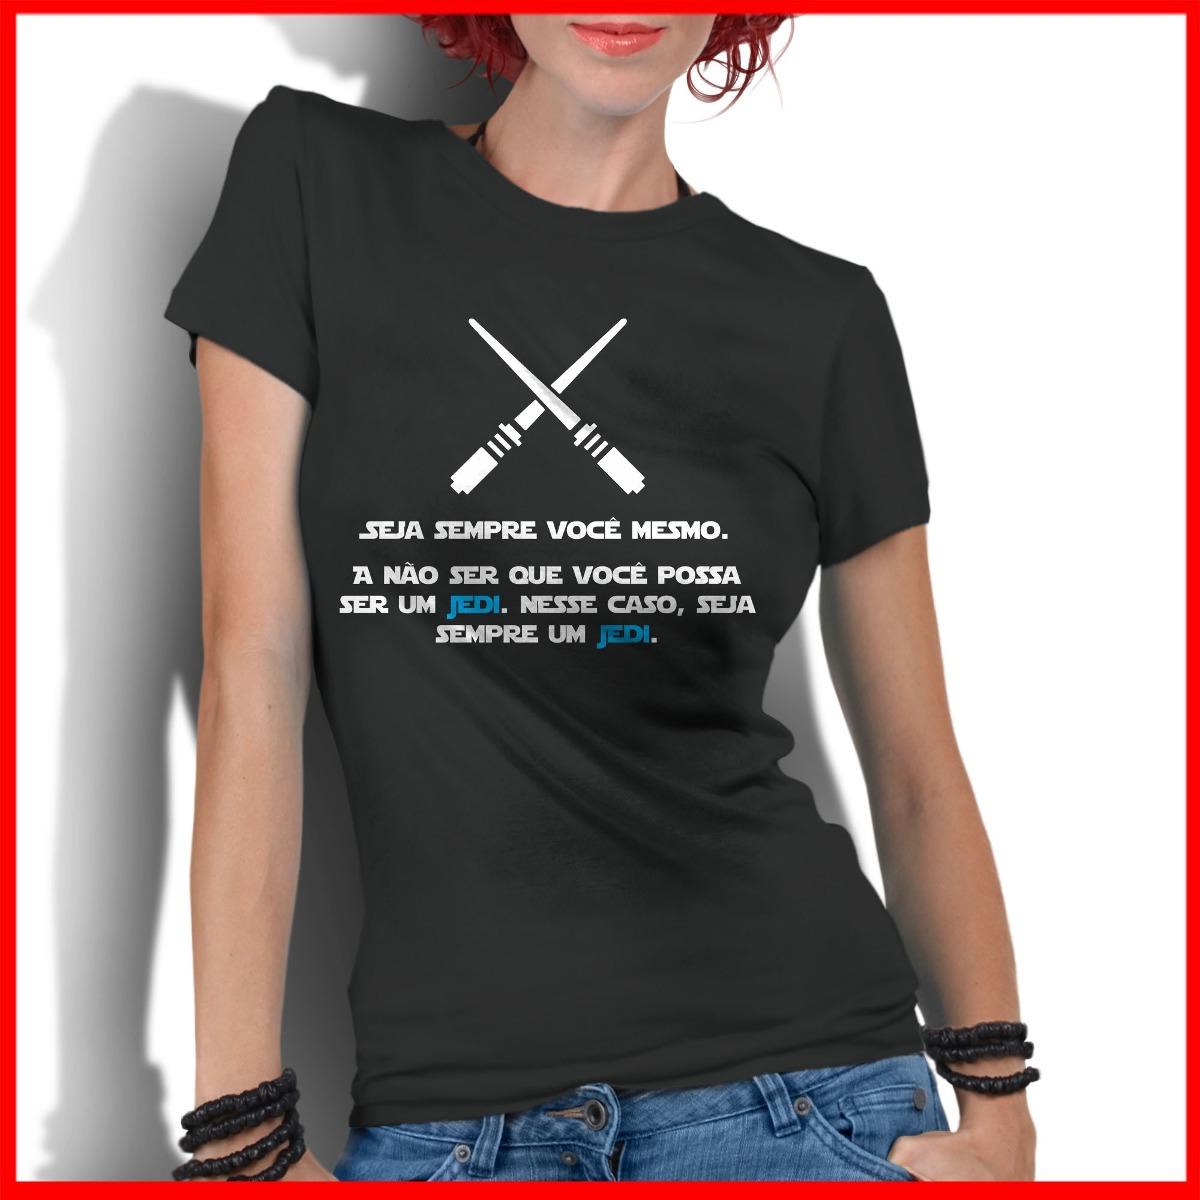 866949e4263c4 camiseta feminina jedi star wars sabre de luz frases camisa. Carregando  zoom.